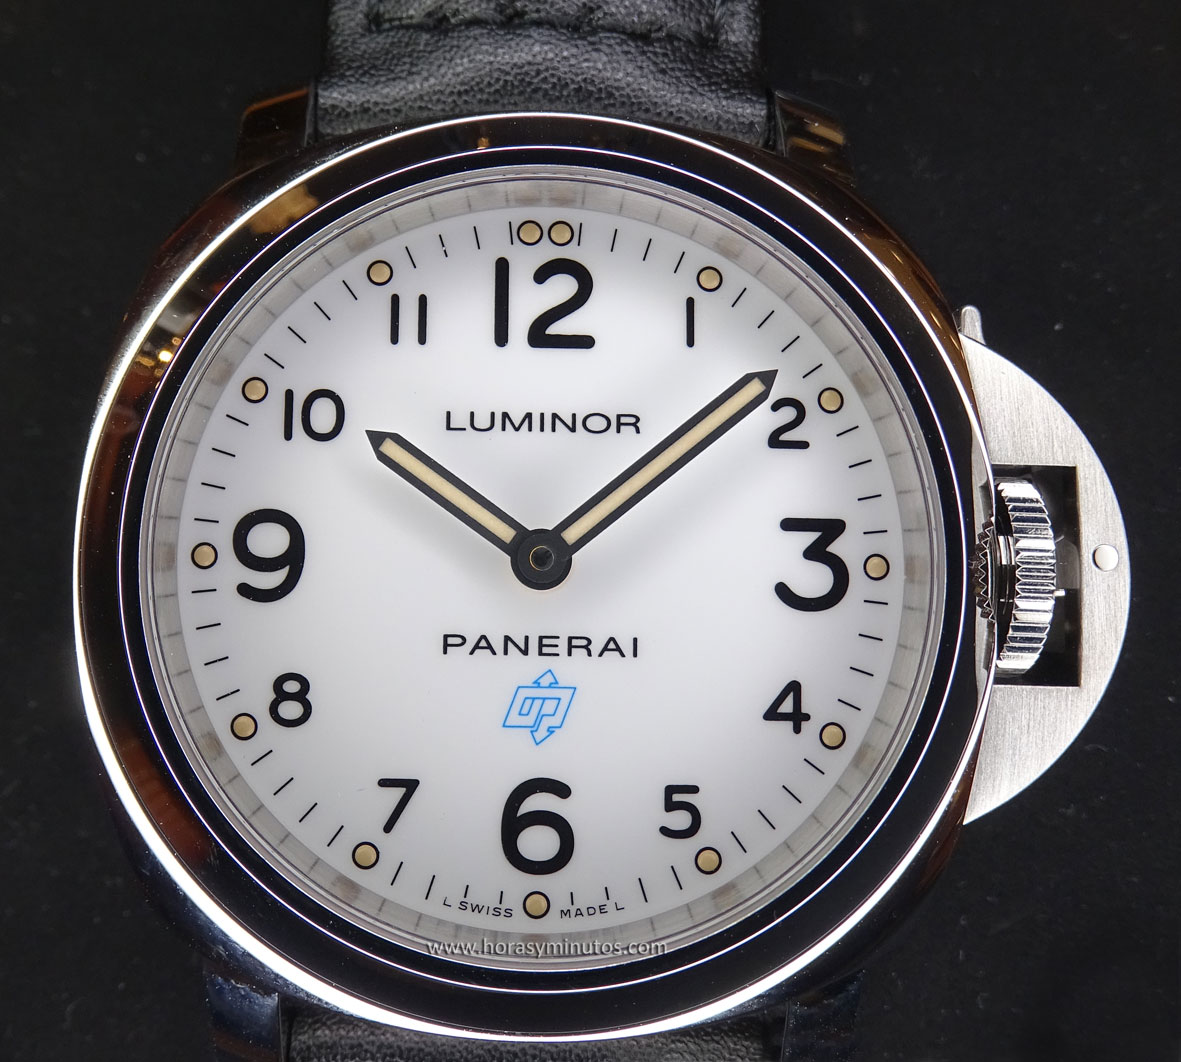 Panerai PAM 00630 frontal